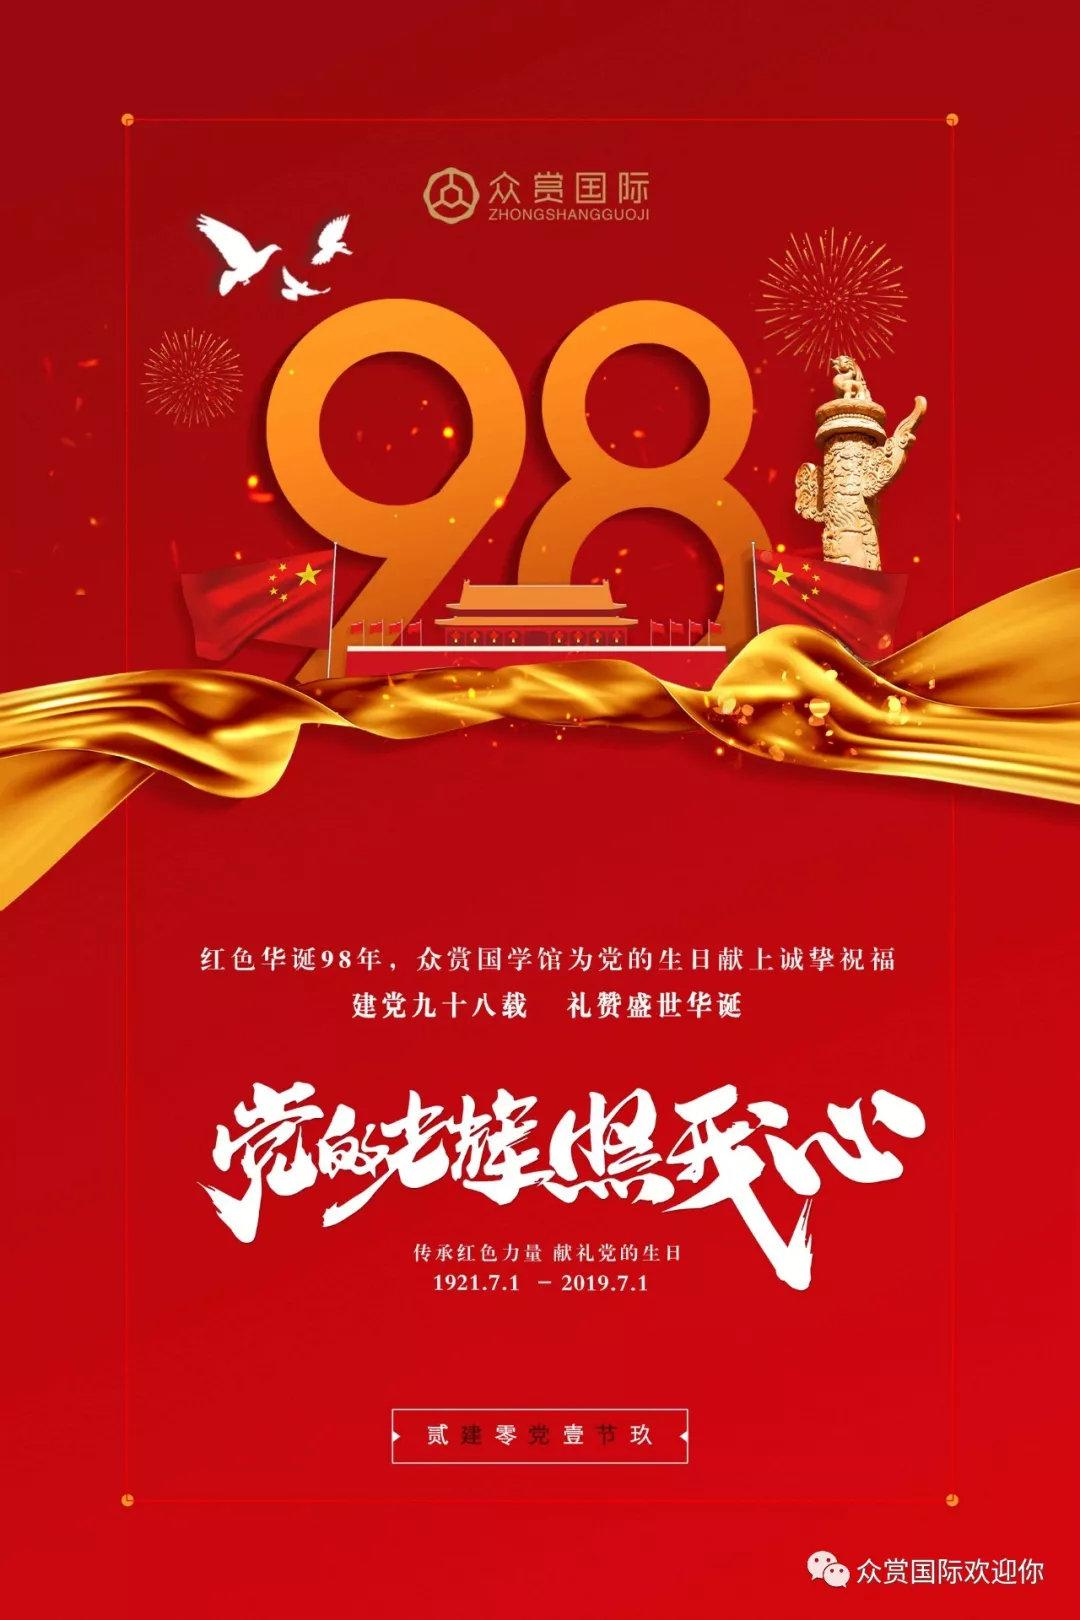 建党98周年 | 追忆峥嵘岁月